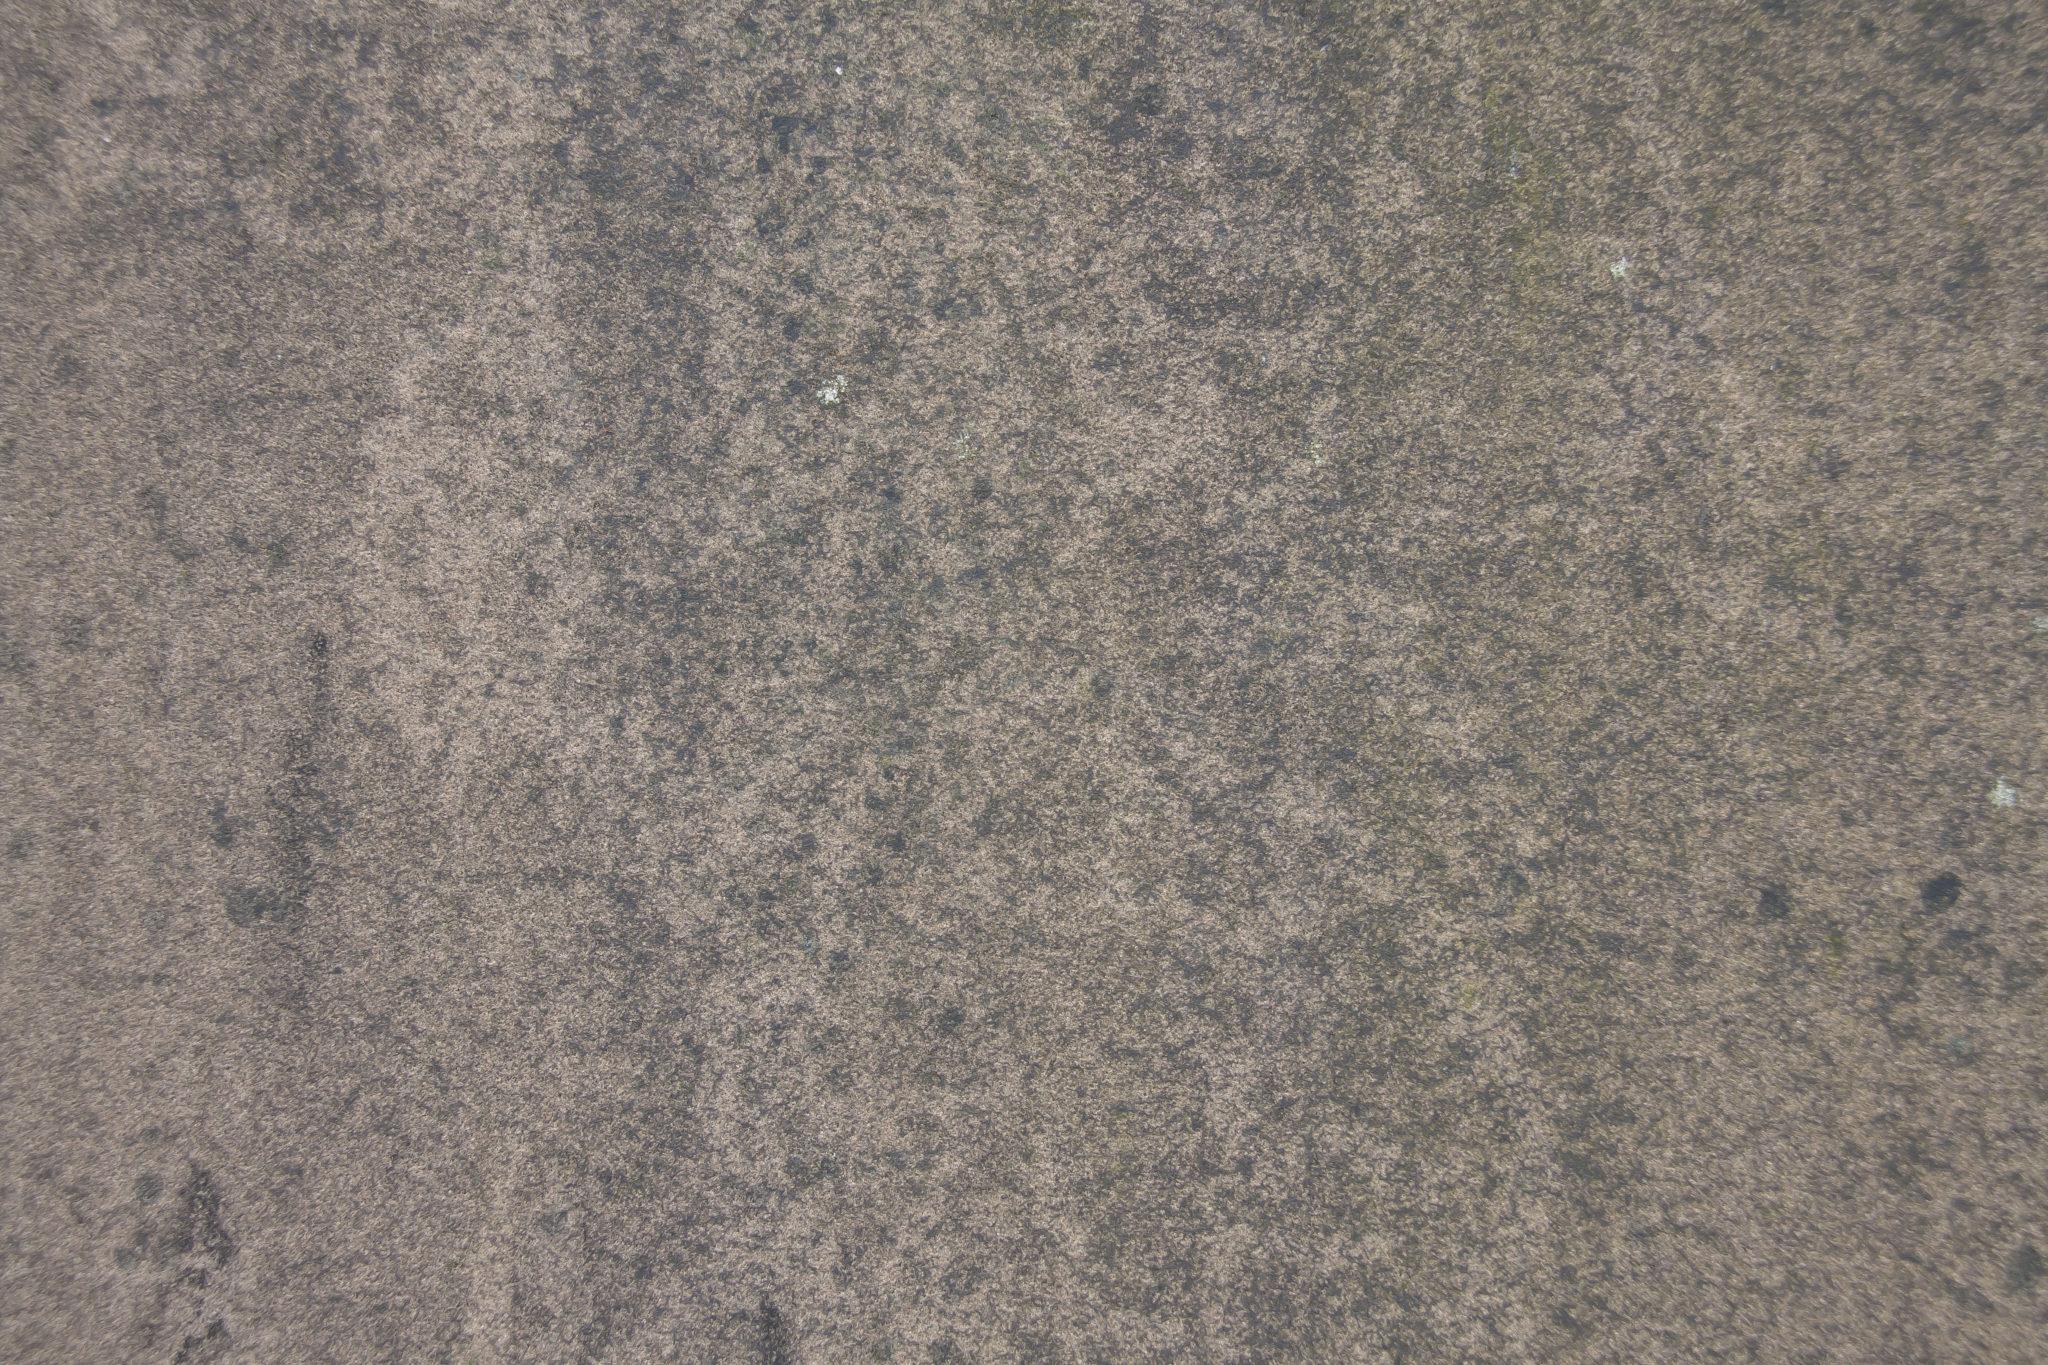 free photoshop textures stone texture